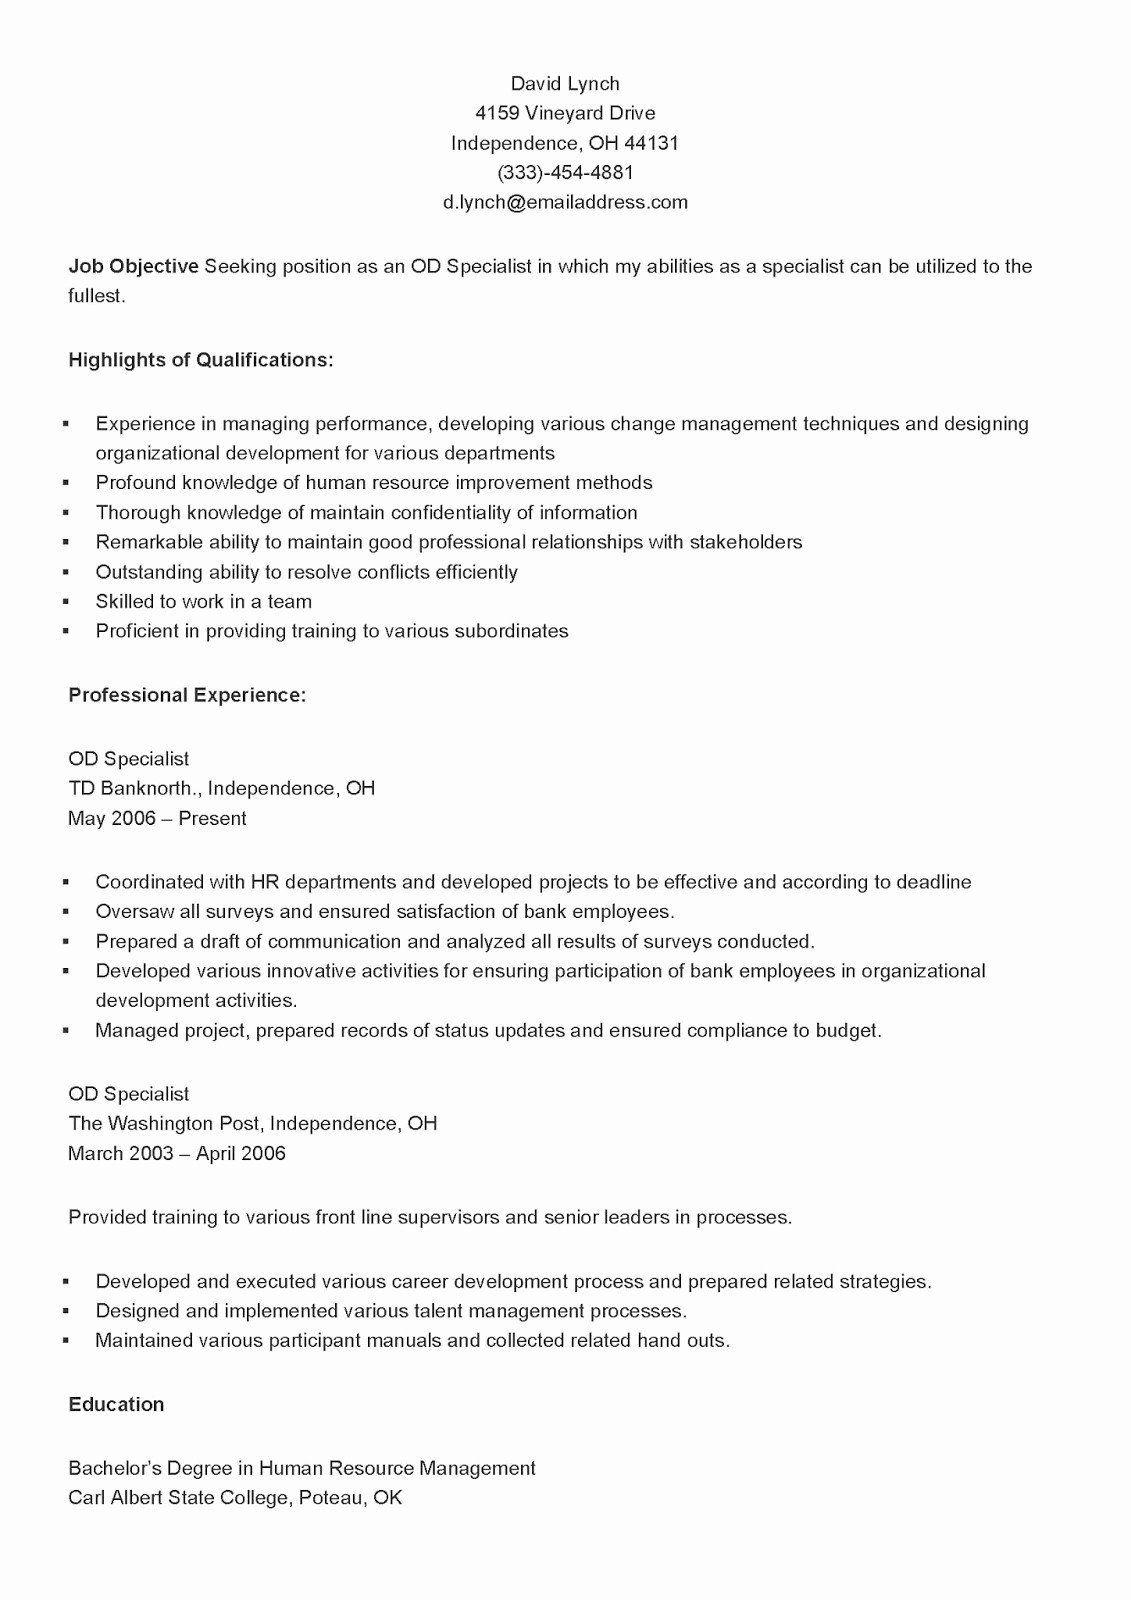 Junior Business Analyst Resume Inspirational Entry Level Business Analyst Resume Sample New Business